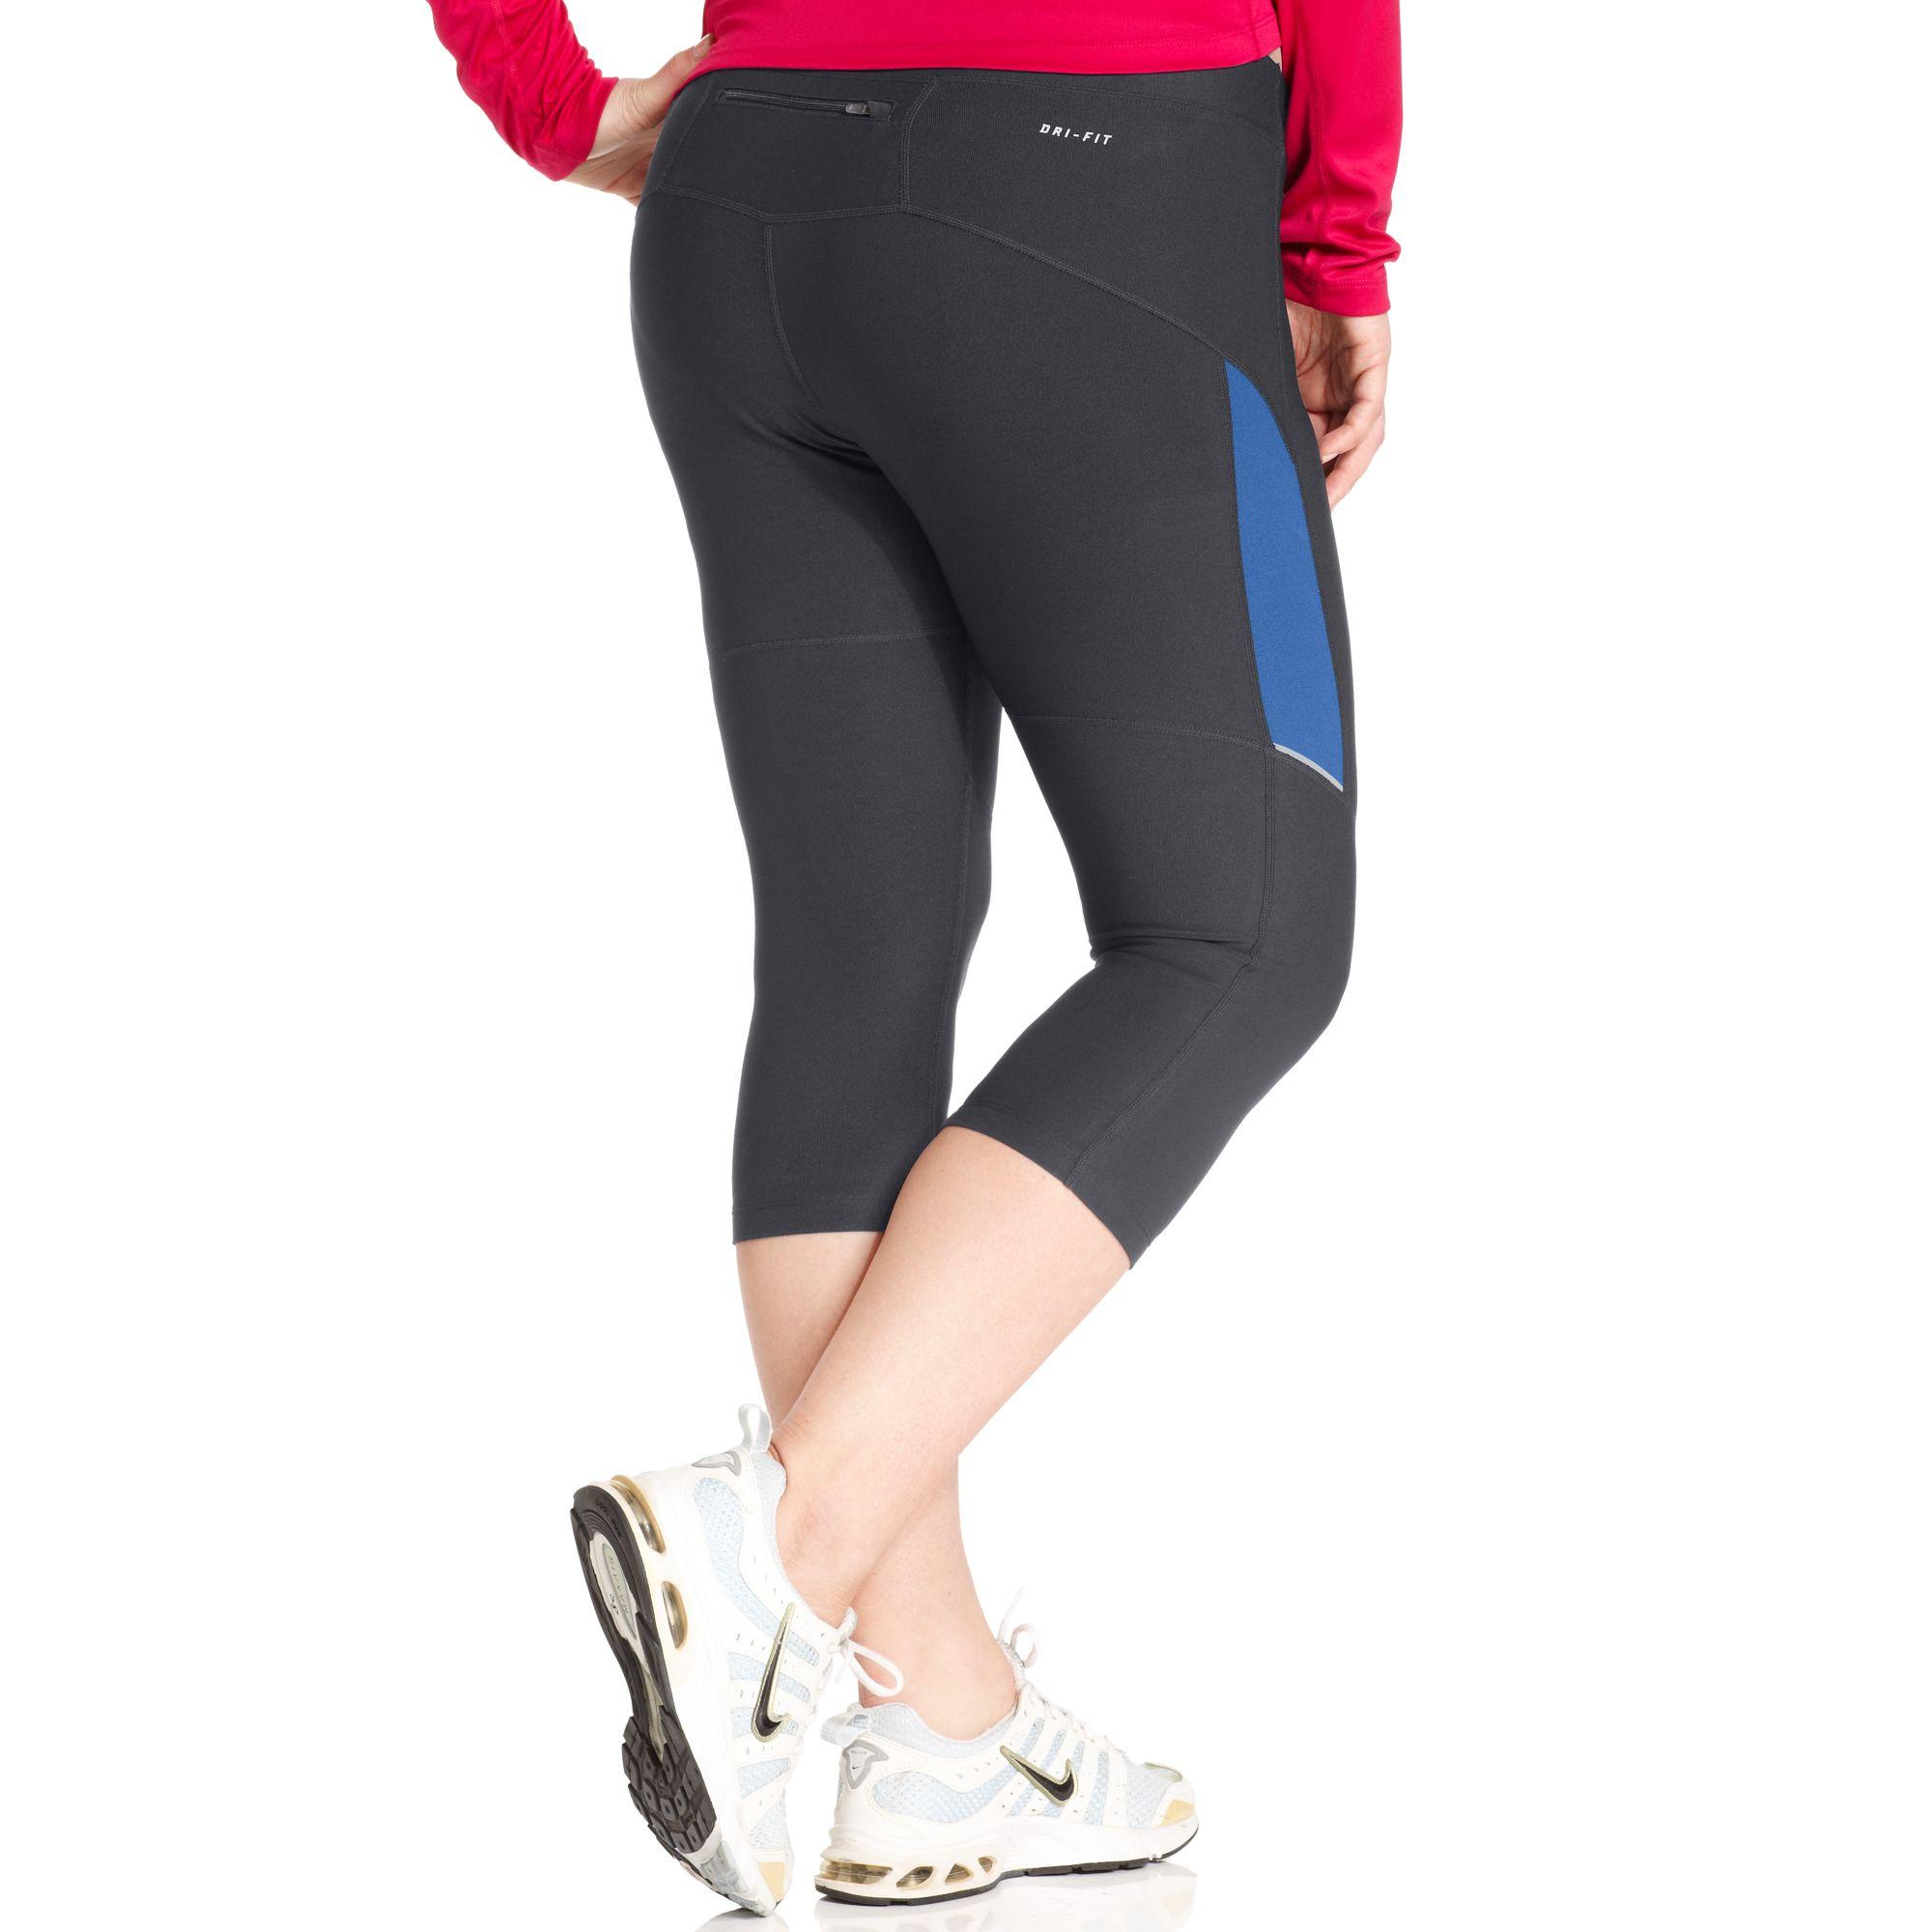 Nike Drifit Active Capri Leggings in Gray (anthracite/distance blue) | Lyst